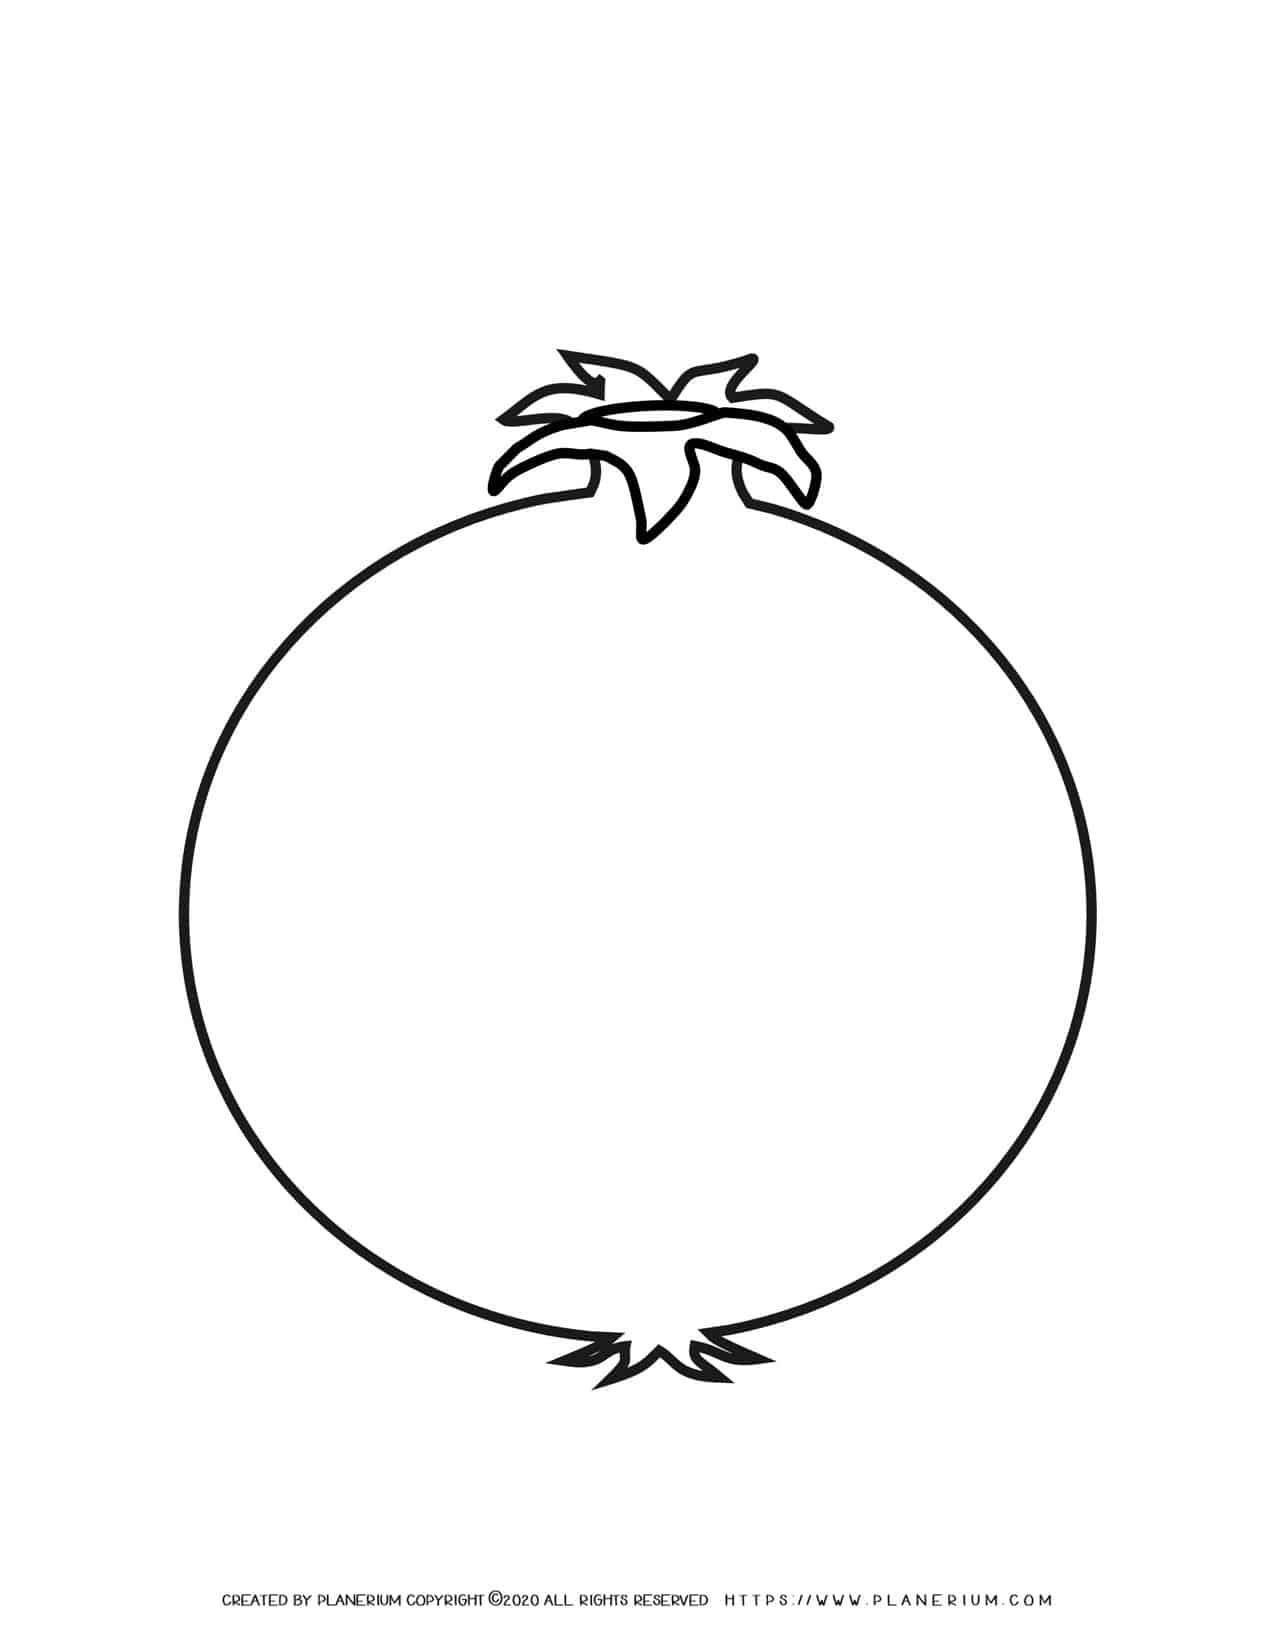 Pomegranate - Coloring page | Planerium